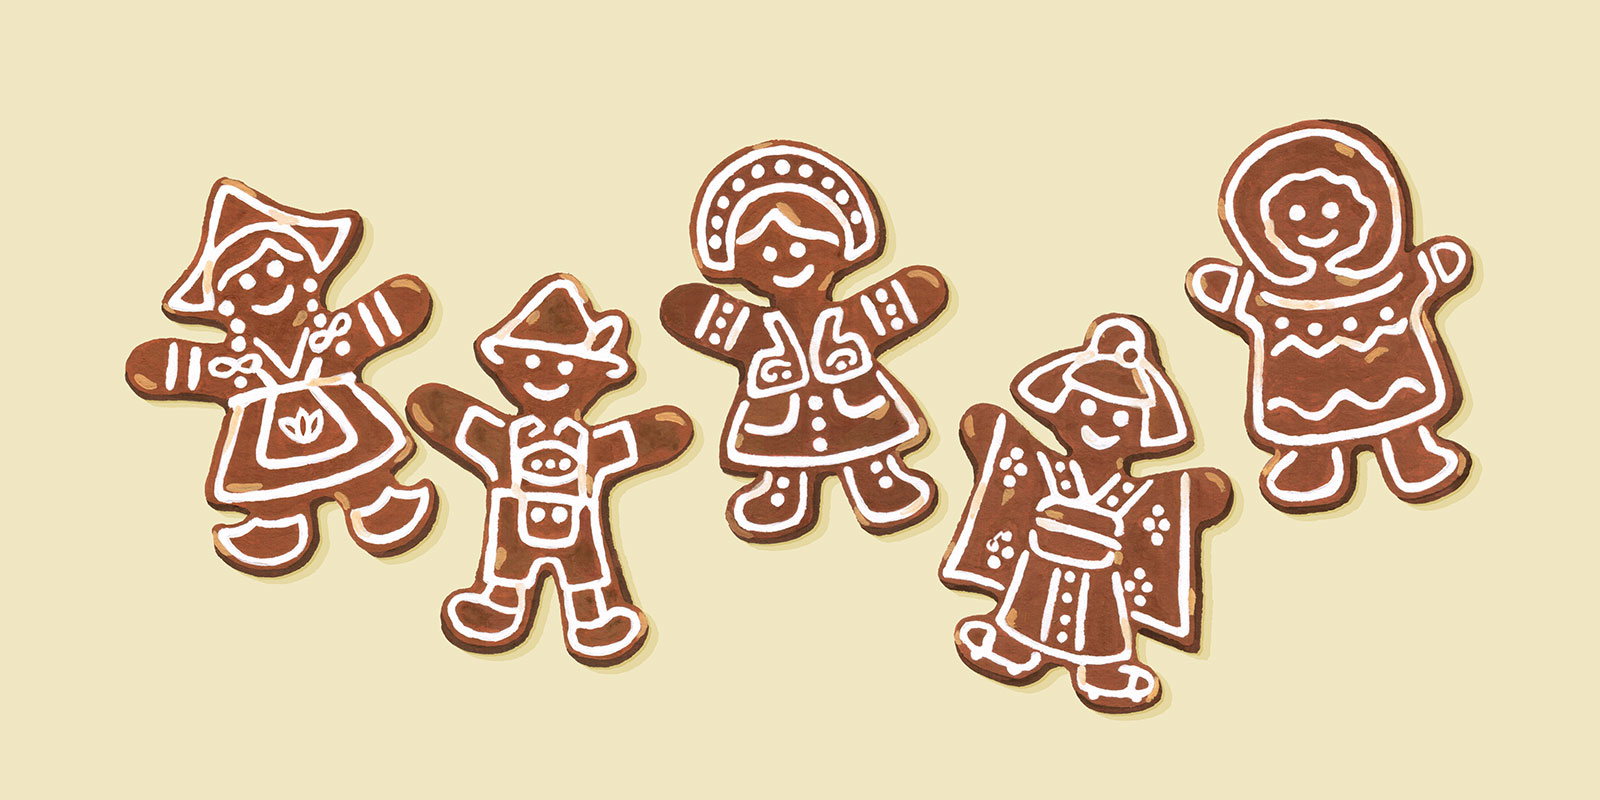 GingerbreadCookies_AndreaGonzalez_AllRightsReserved.jpg